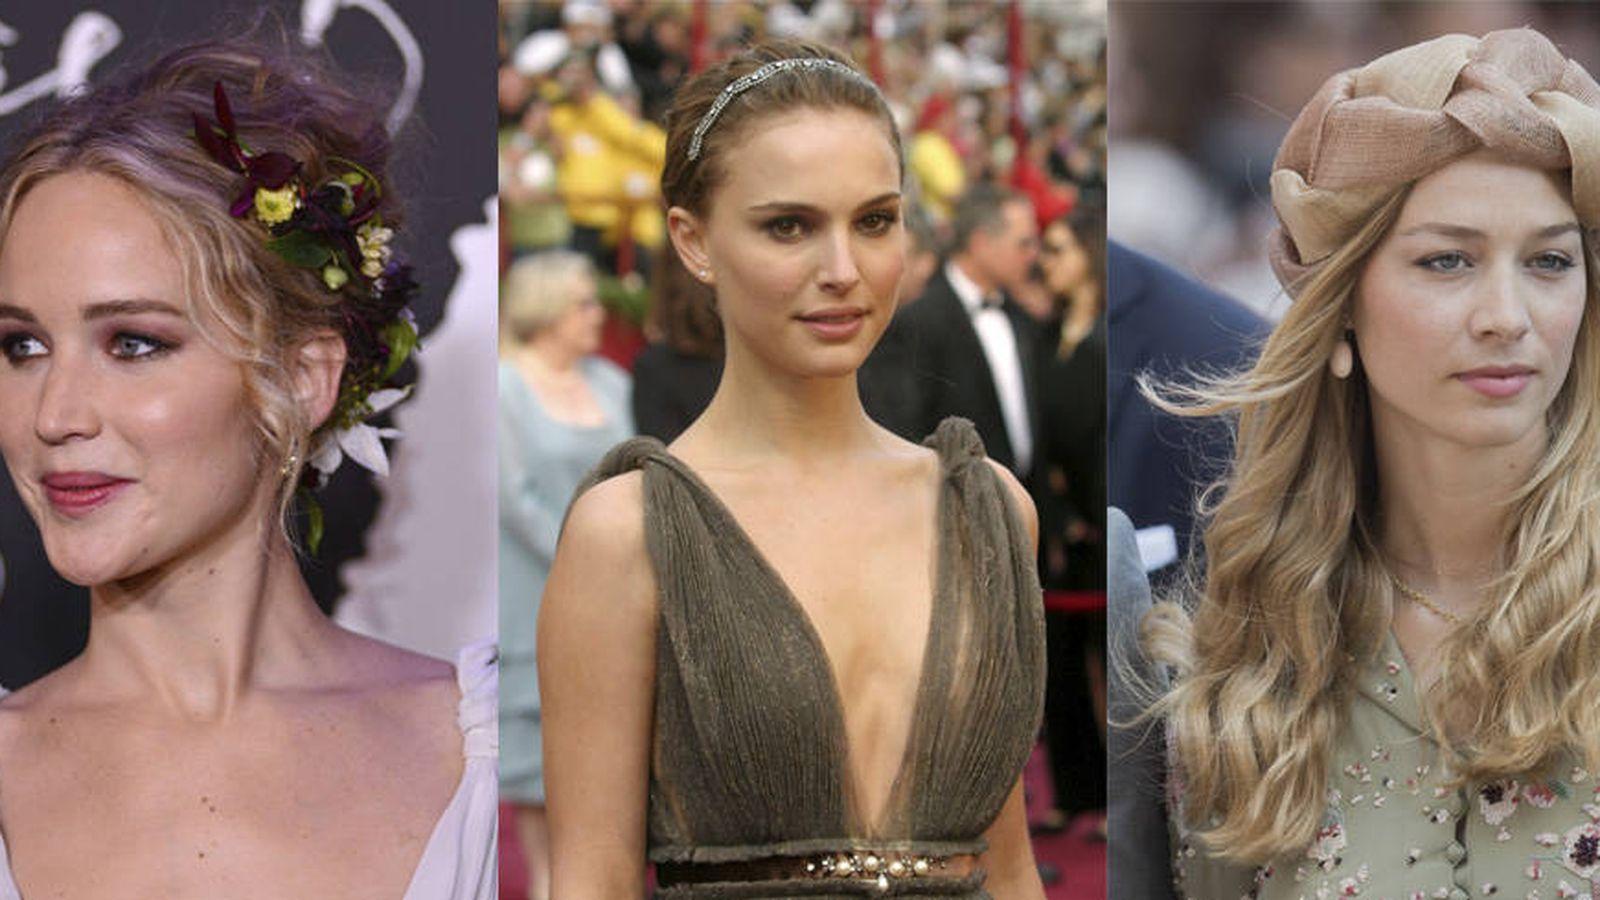 Foto: De Jennifer Lawrence a Natalie Portman o Beatrice Borromeo, o cómo llevar el tocado perfecto. (Fotos: Getty Images, Gtres)